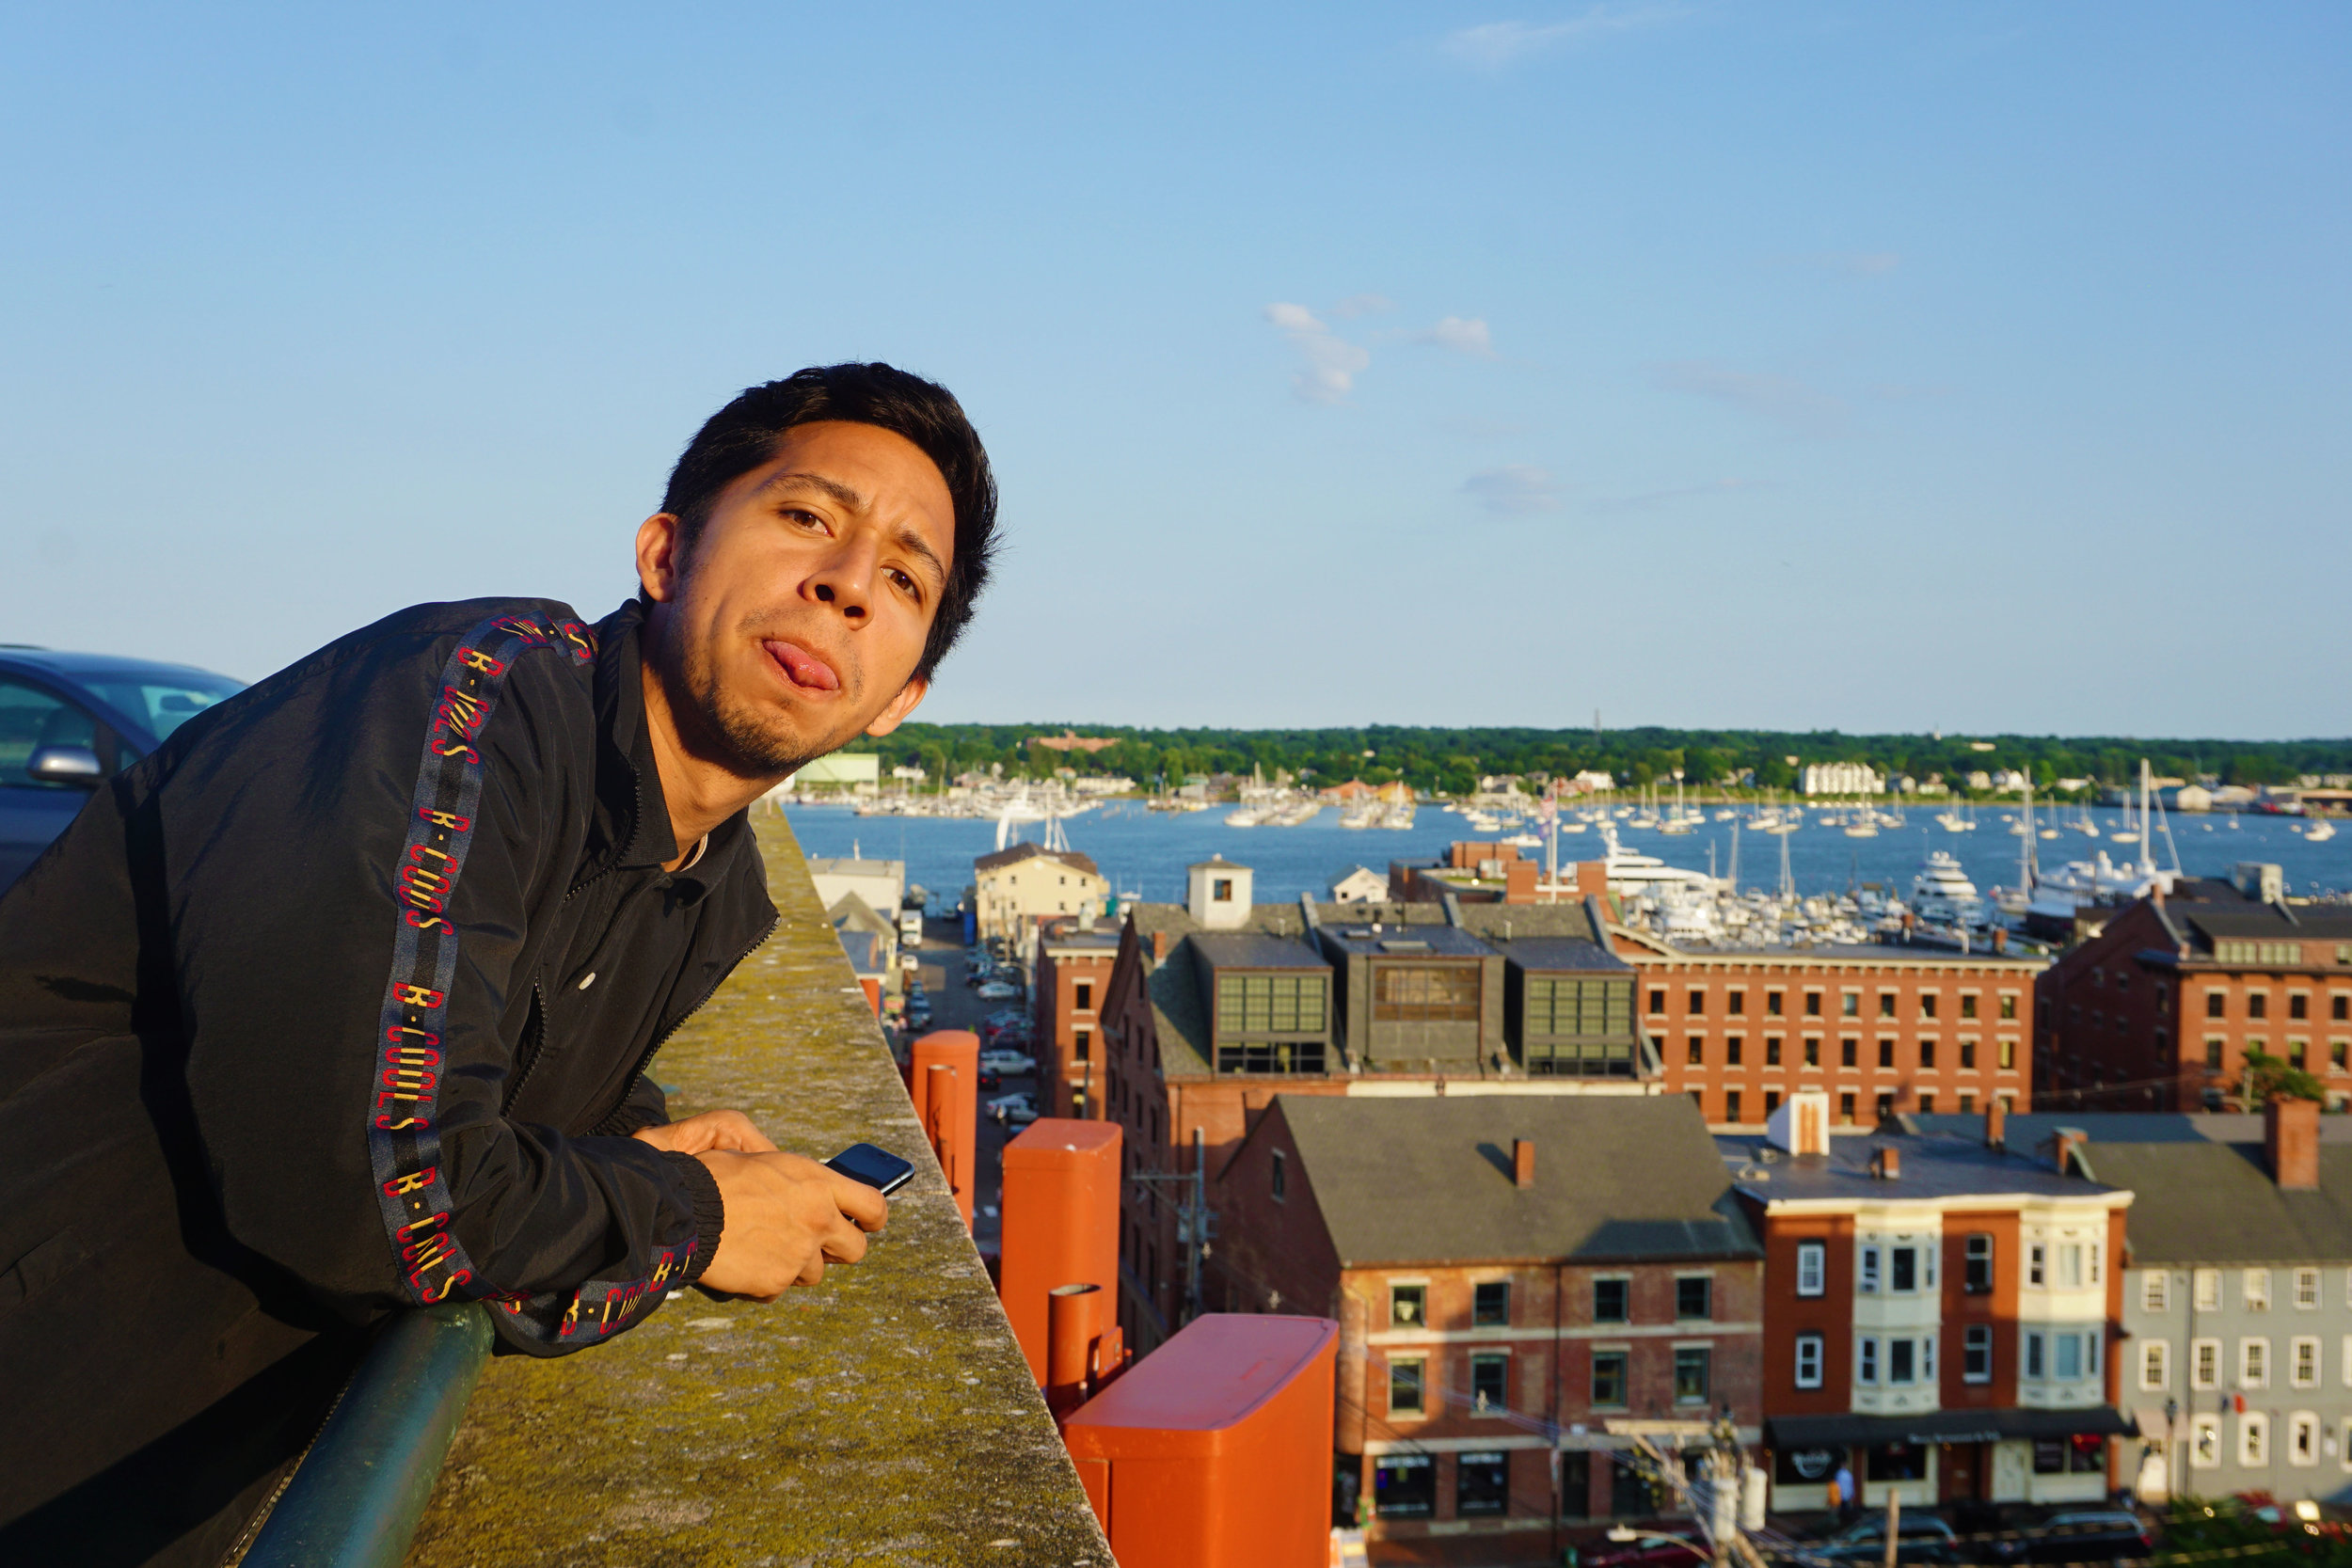 Rooftop photoshoots